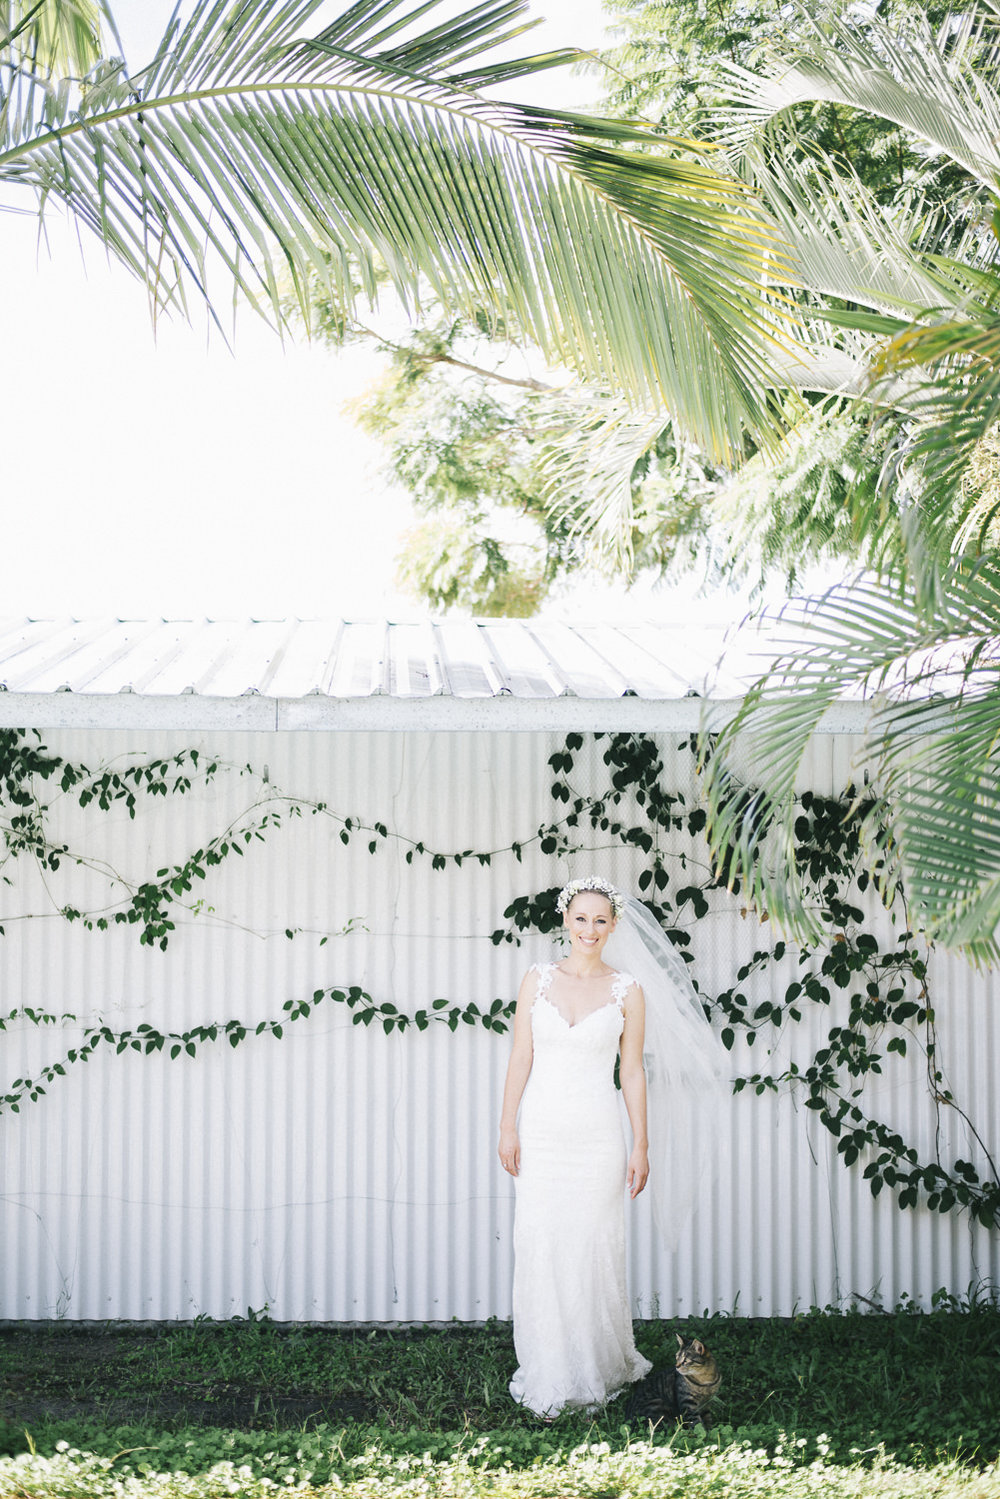 Ryan-sarah-jfk-wood-fire-gold-coast-wedding-41.jpg